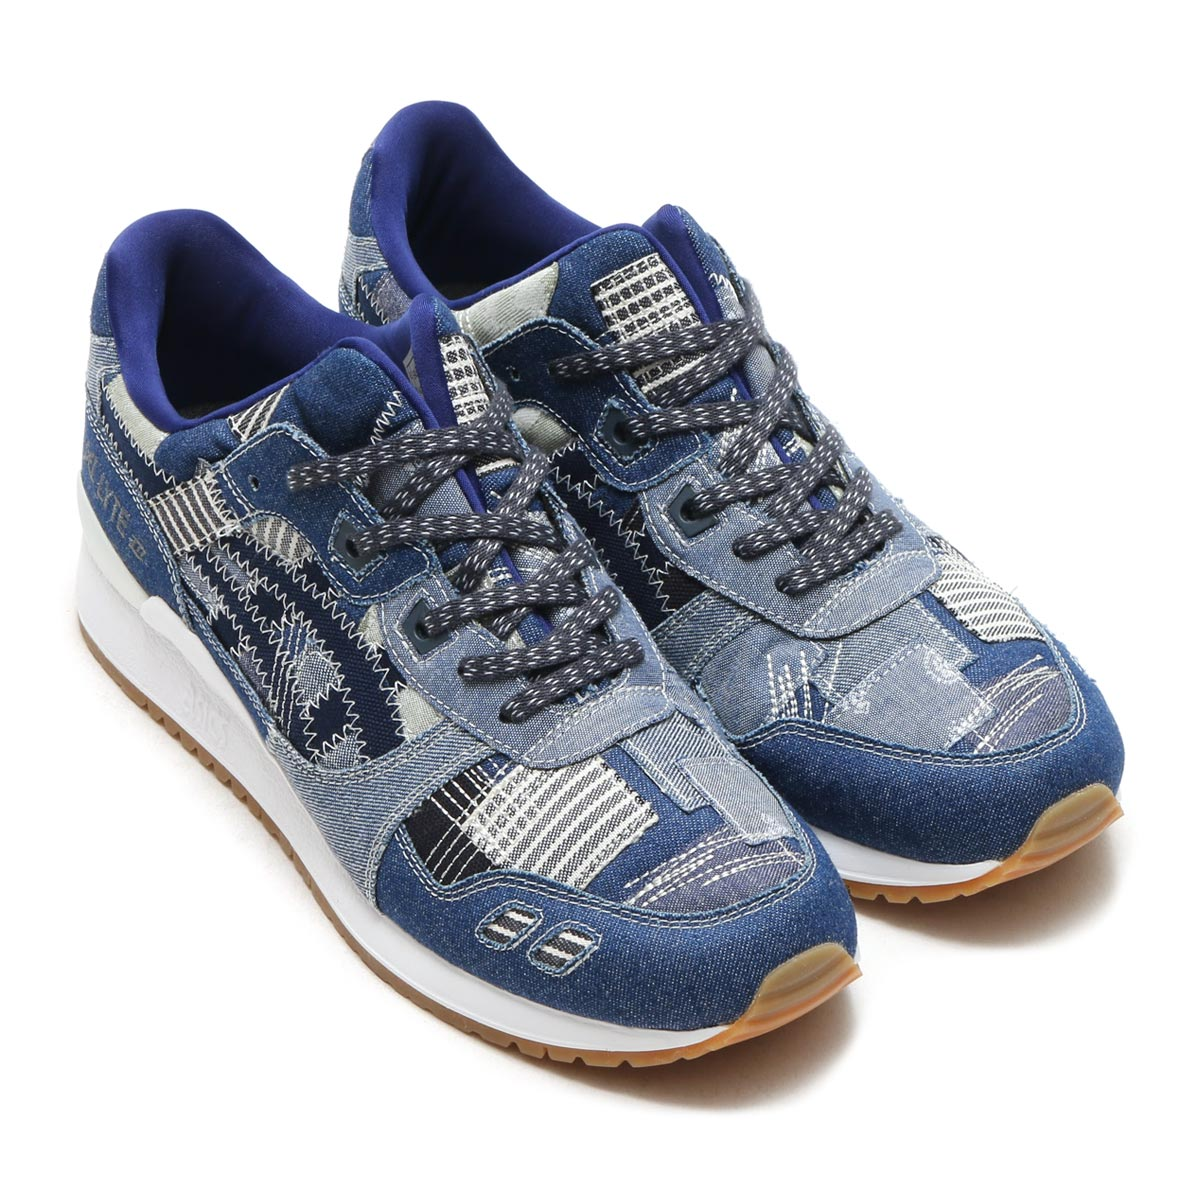 asics tiger gel-lyte ii ranru pack indigo blue 3